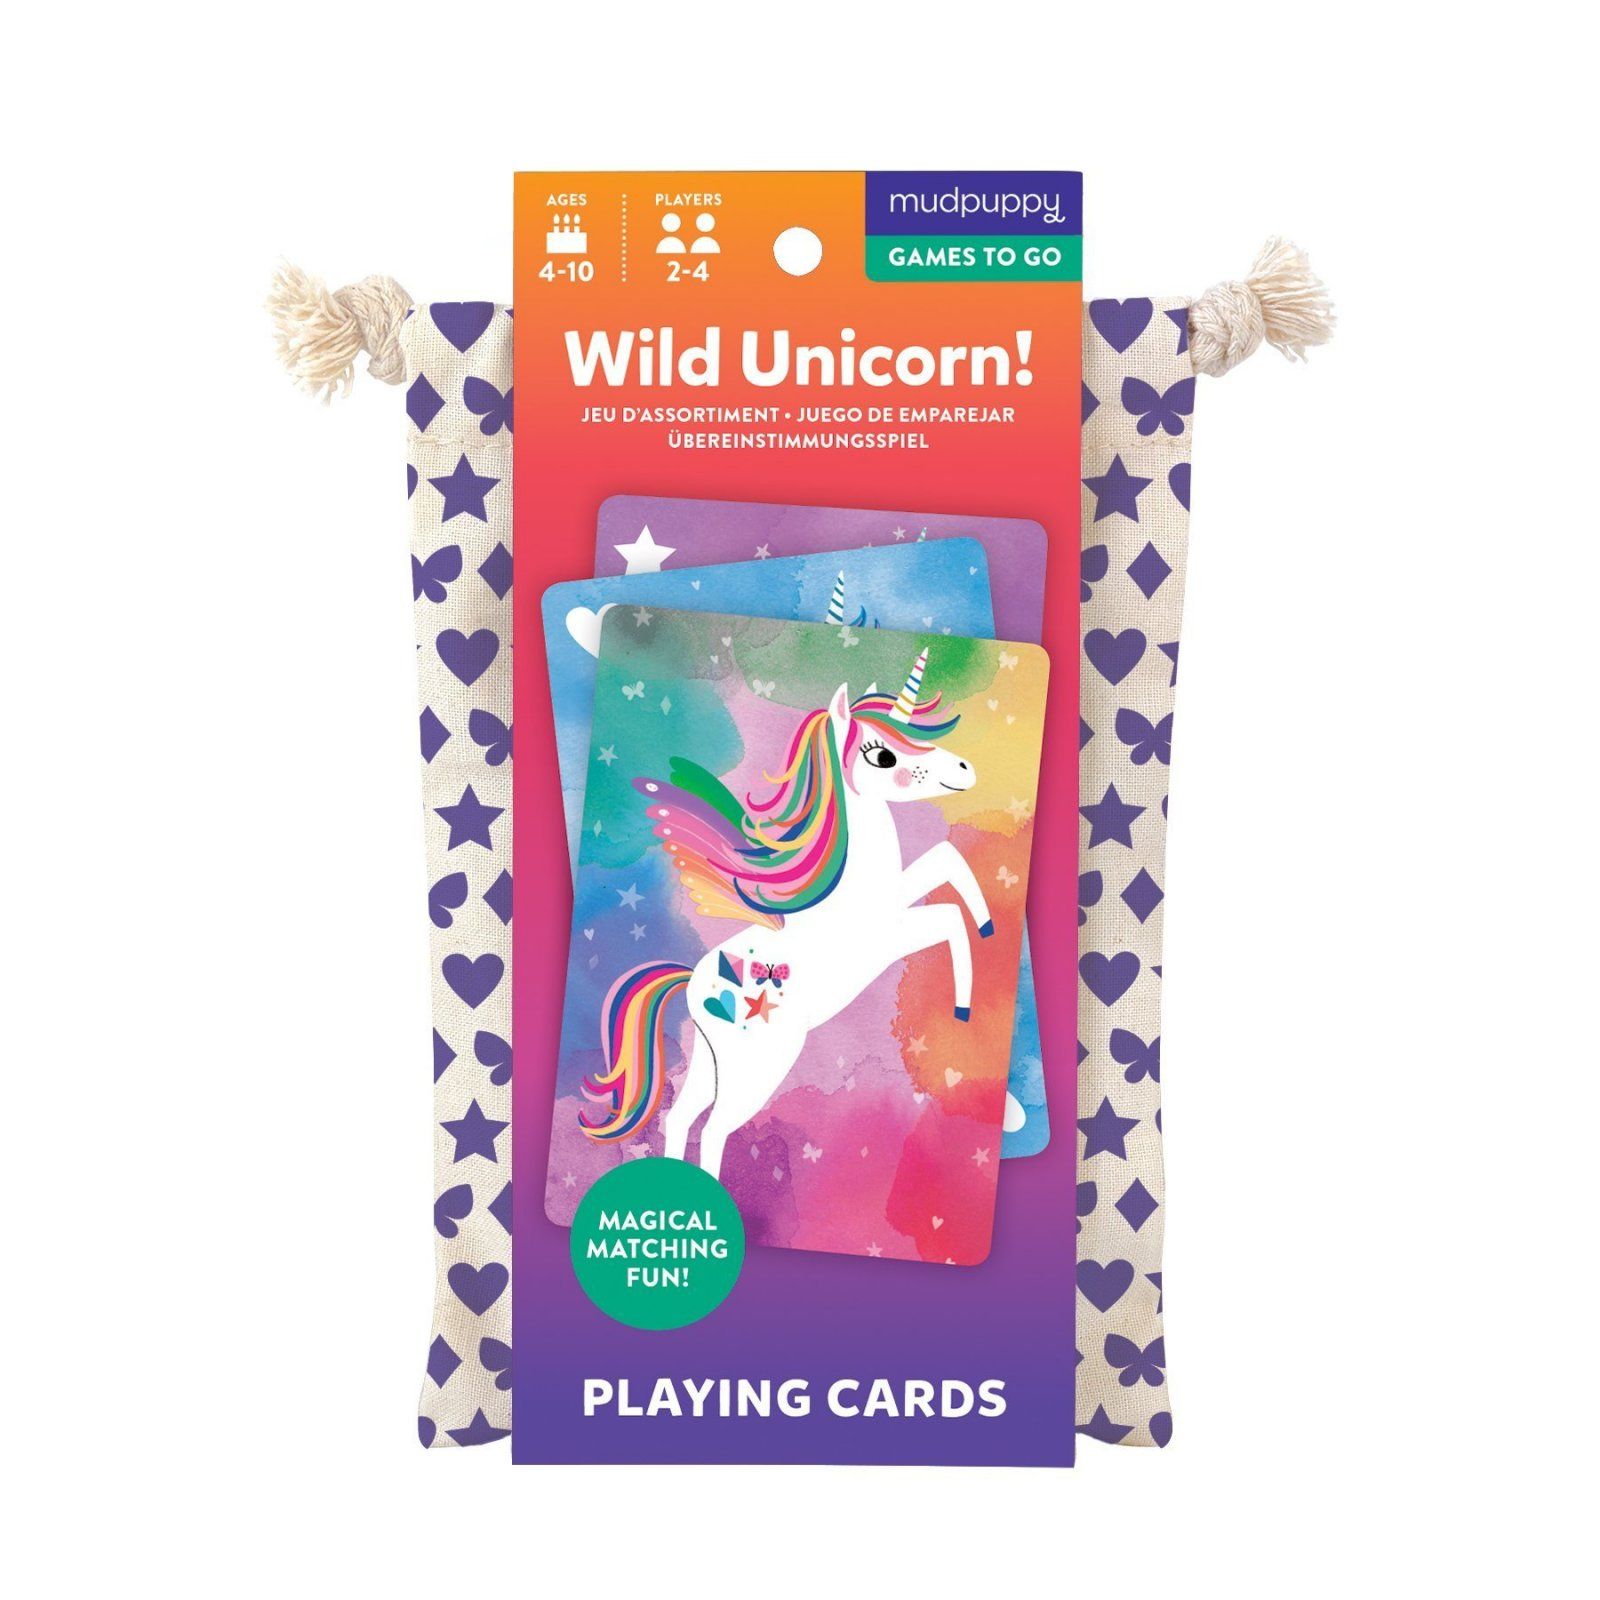 Wild Unicorn! Playing Card Game to Go